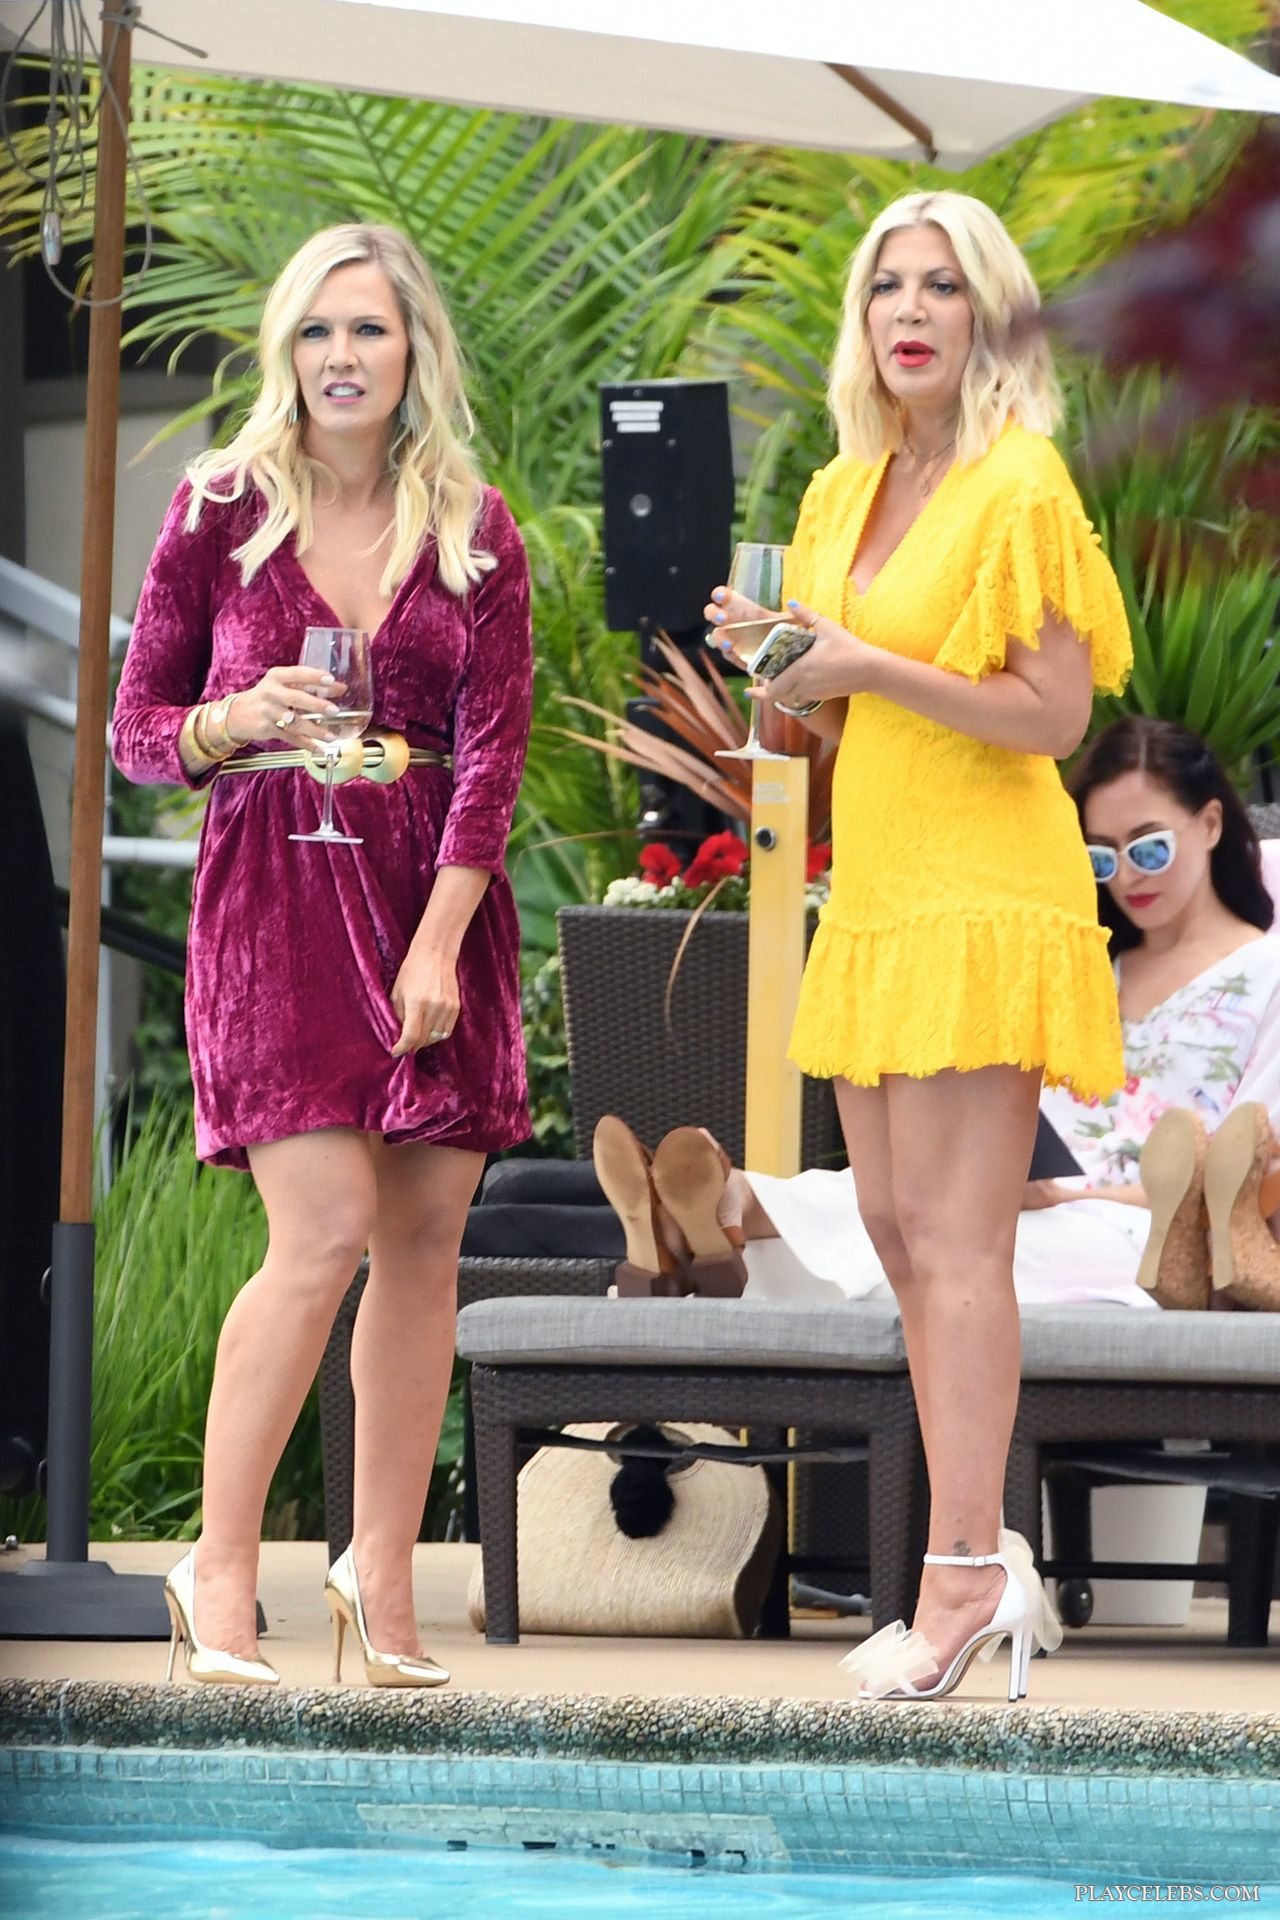 Tori Spelling & Jennie Garth Paparazzi Sexy Cleavage Photos